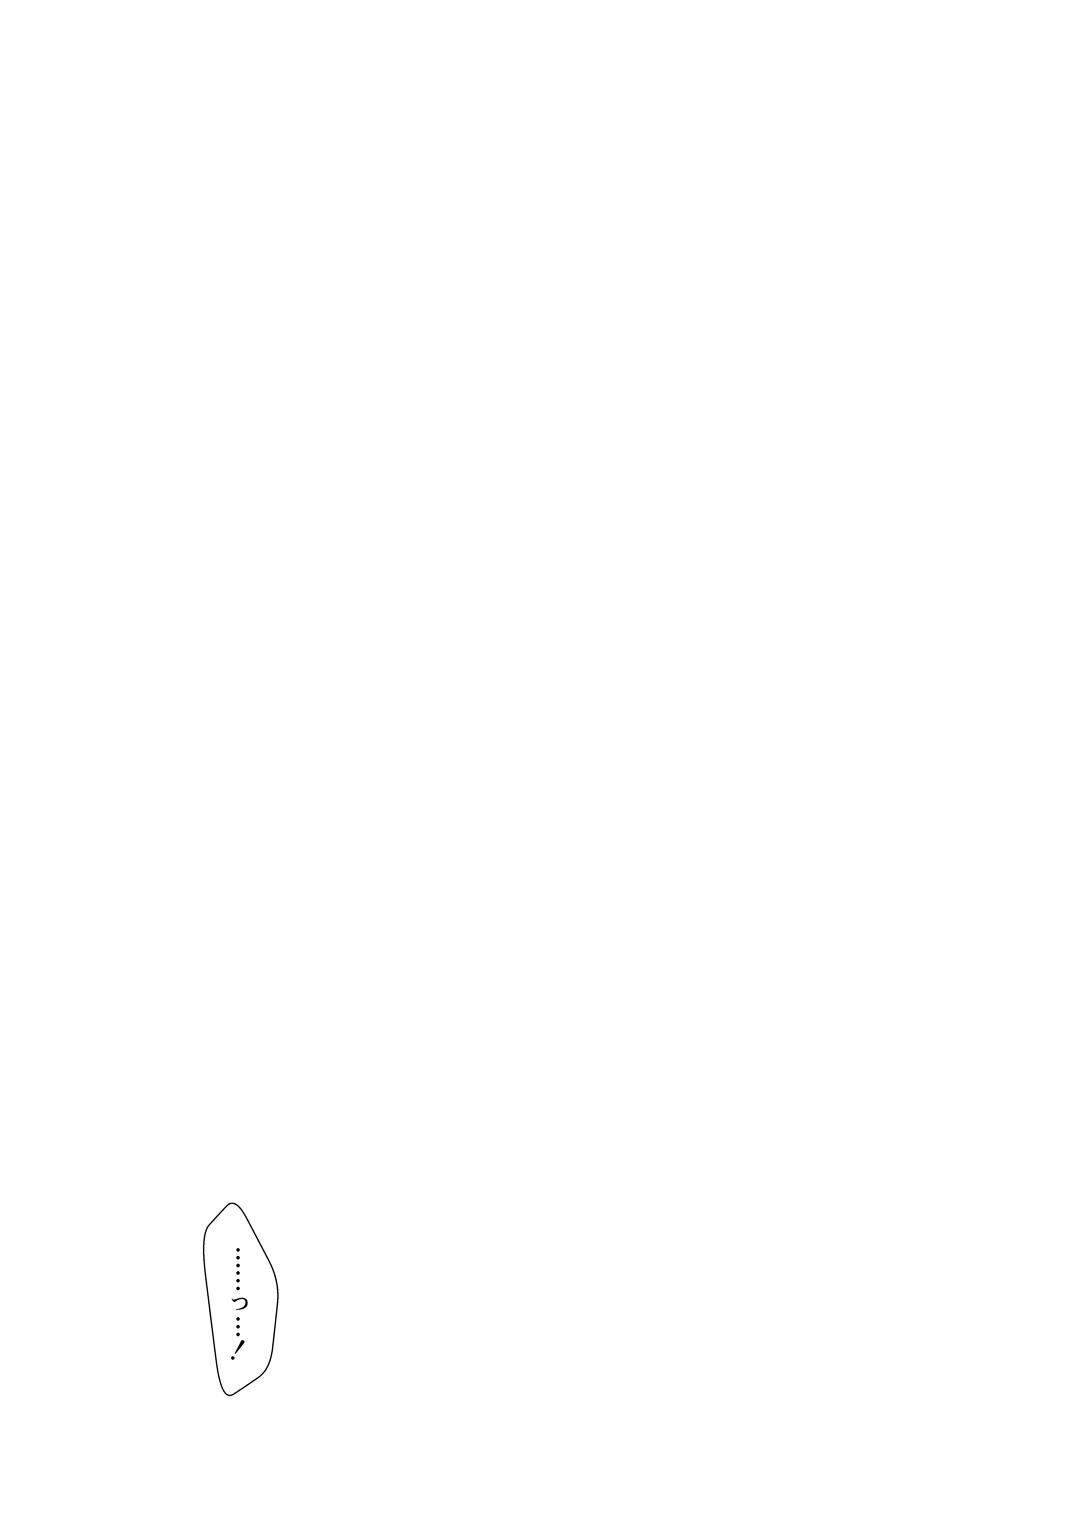 Toshiki mada 1○ dakara 2